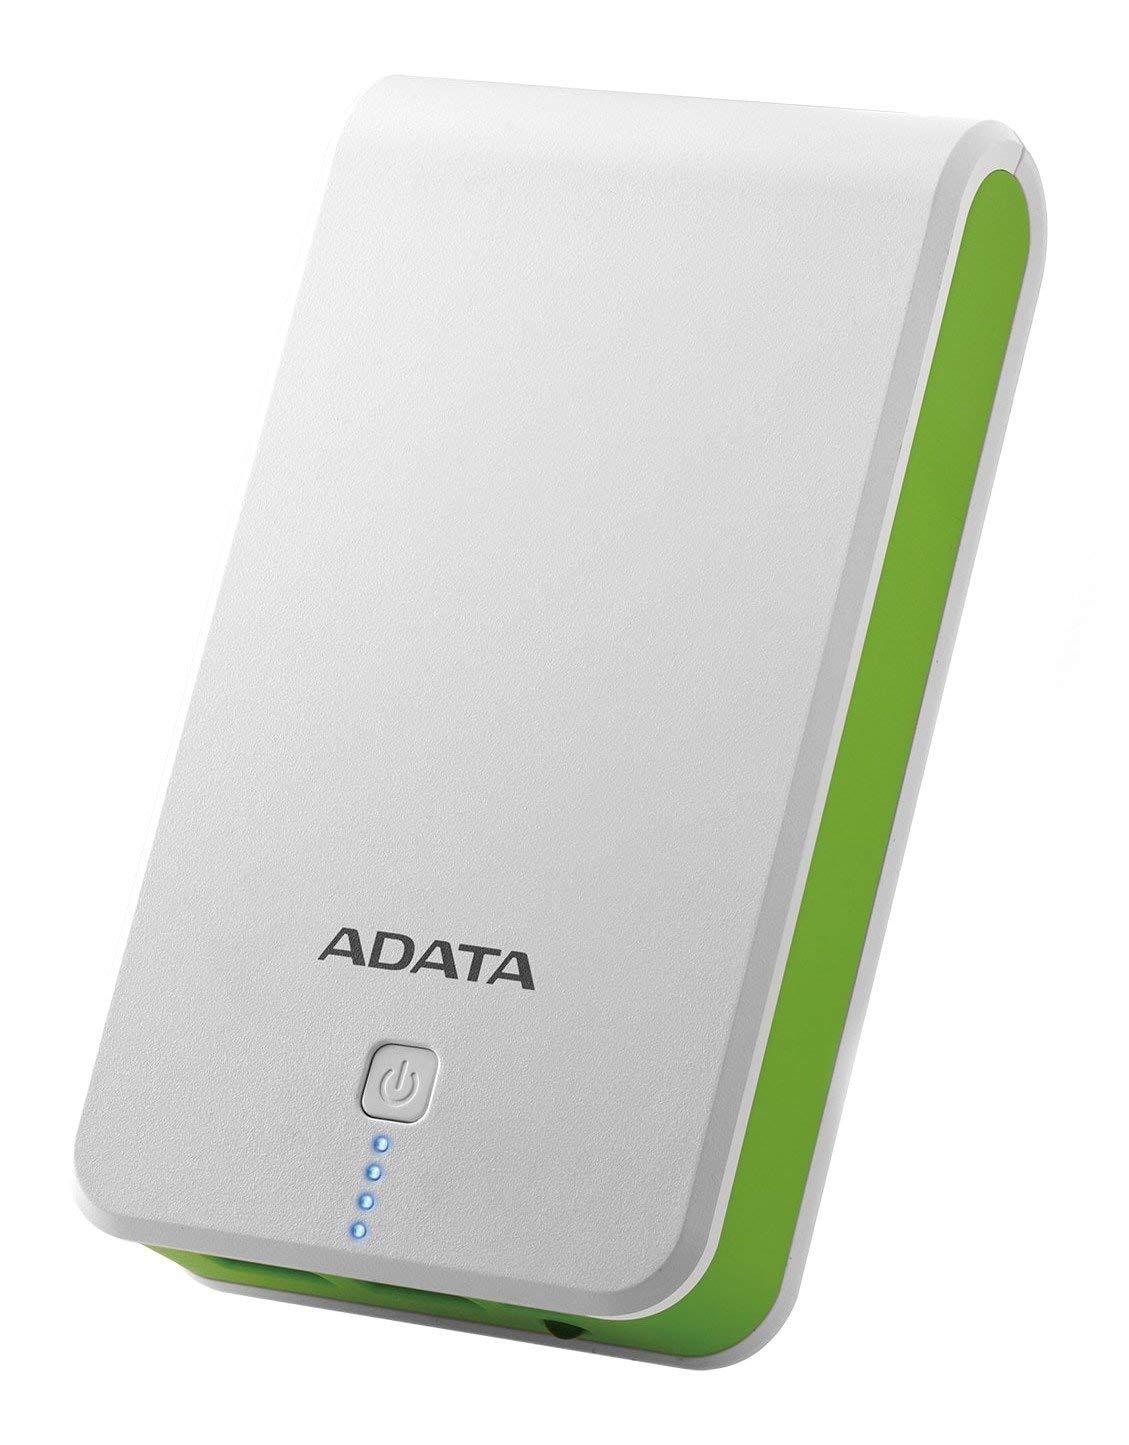 Amazon.com: ADATA p20100 20100 mAh de gran capacidad doble ...